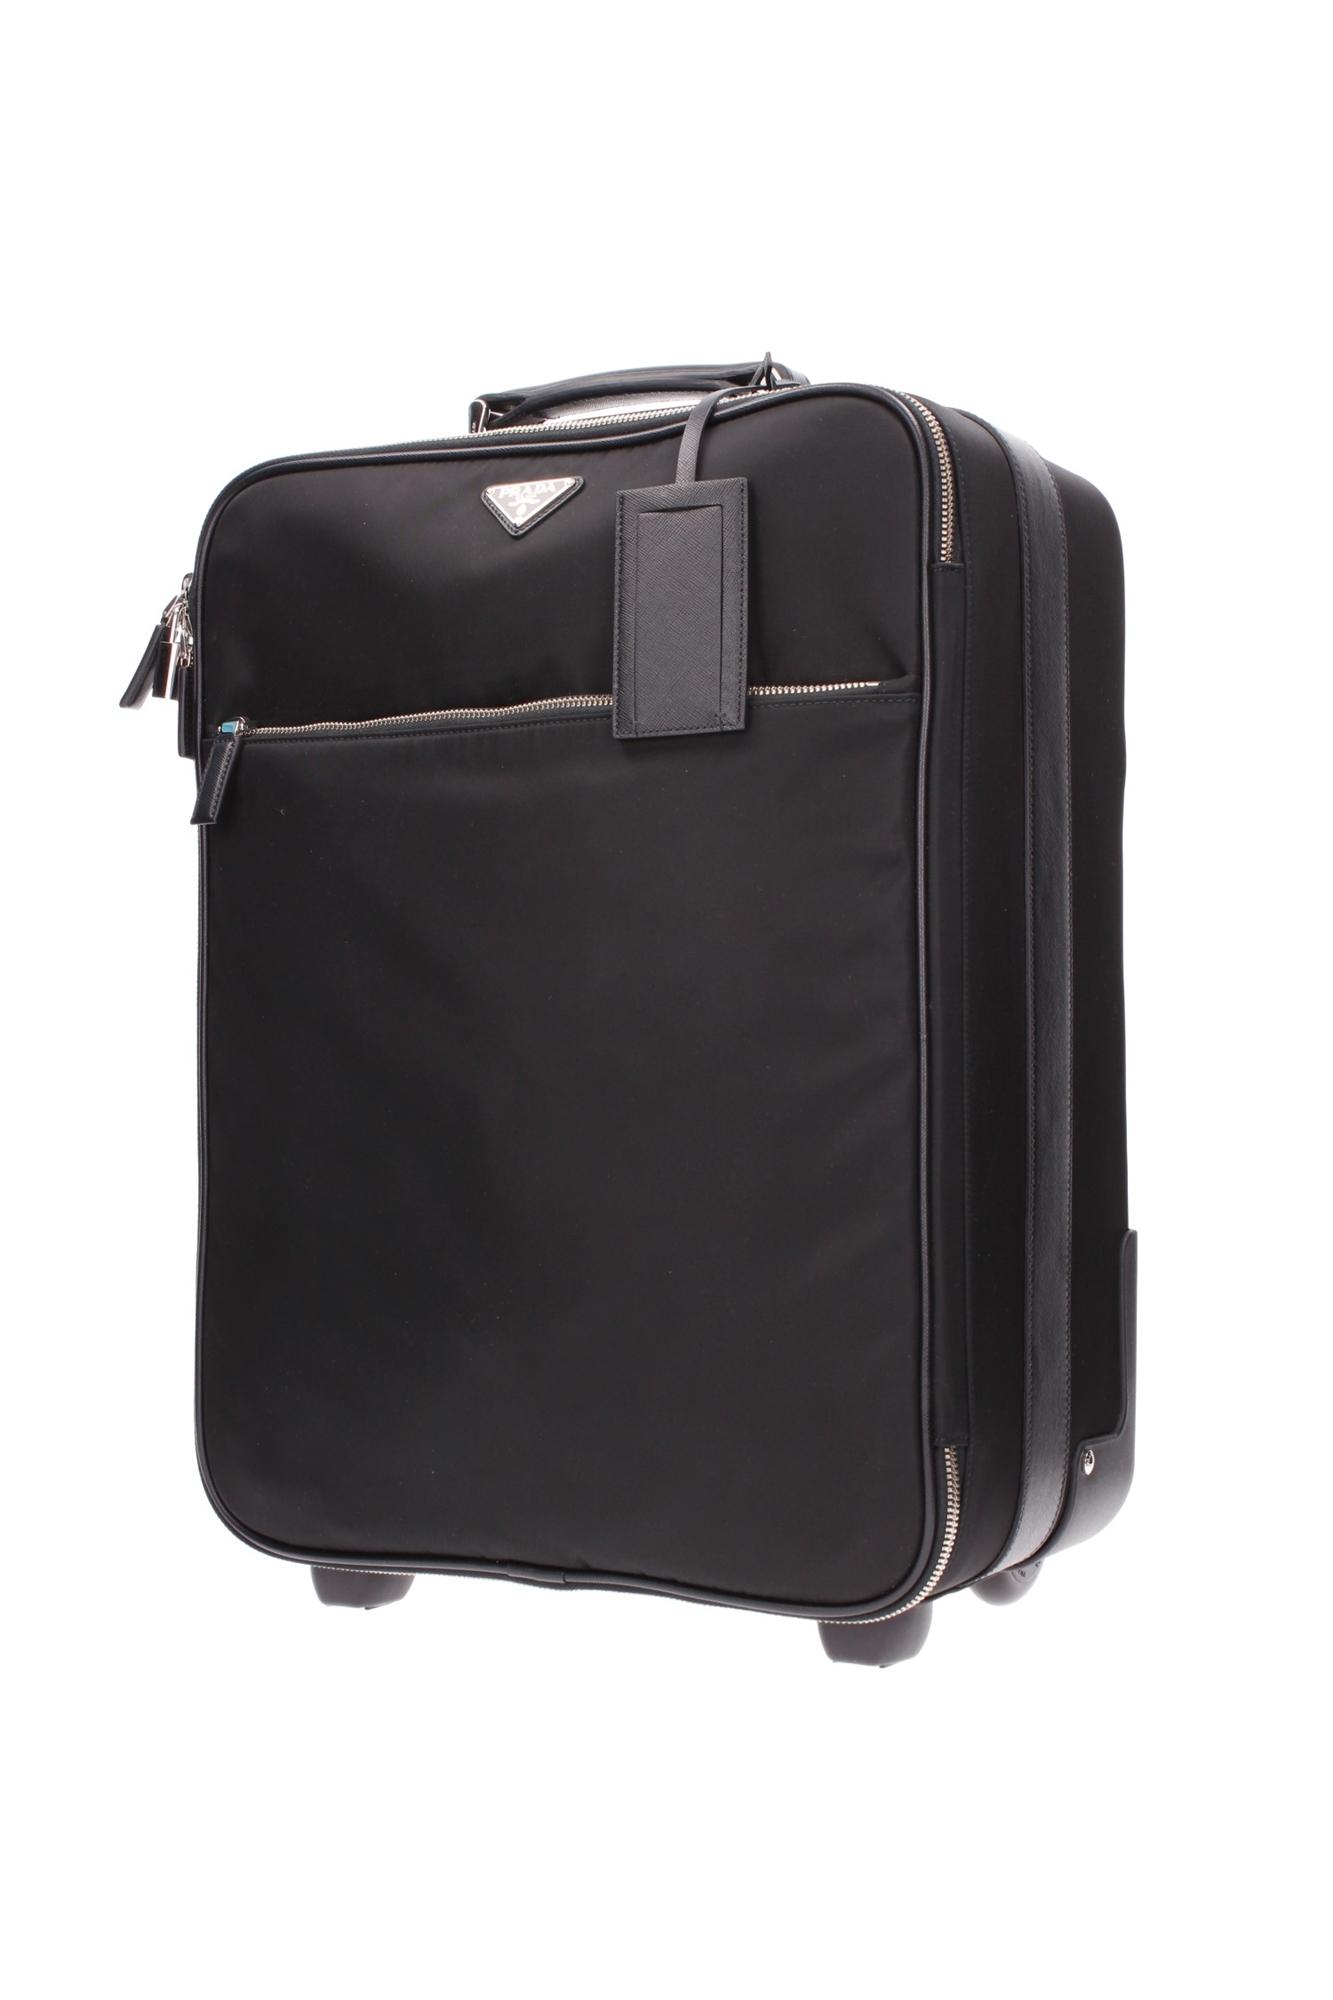 Luggage and Travel Bags Prada Men Fabric Black VV030MNERO | eBay